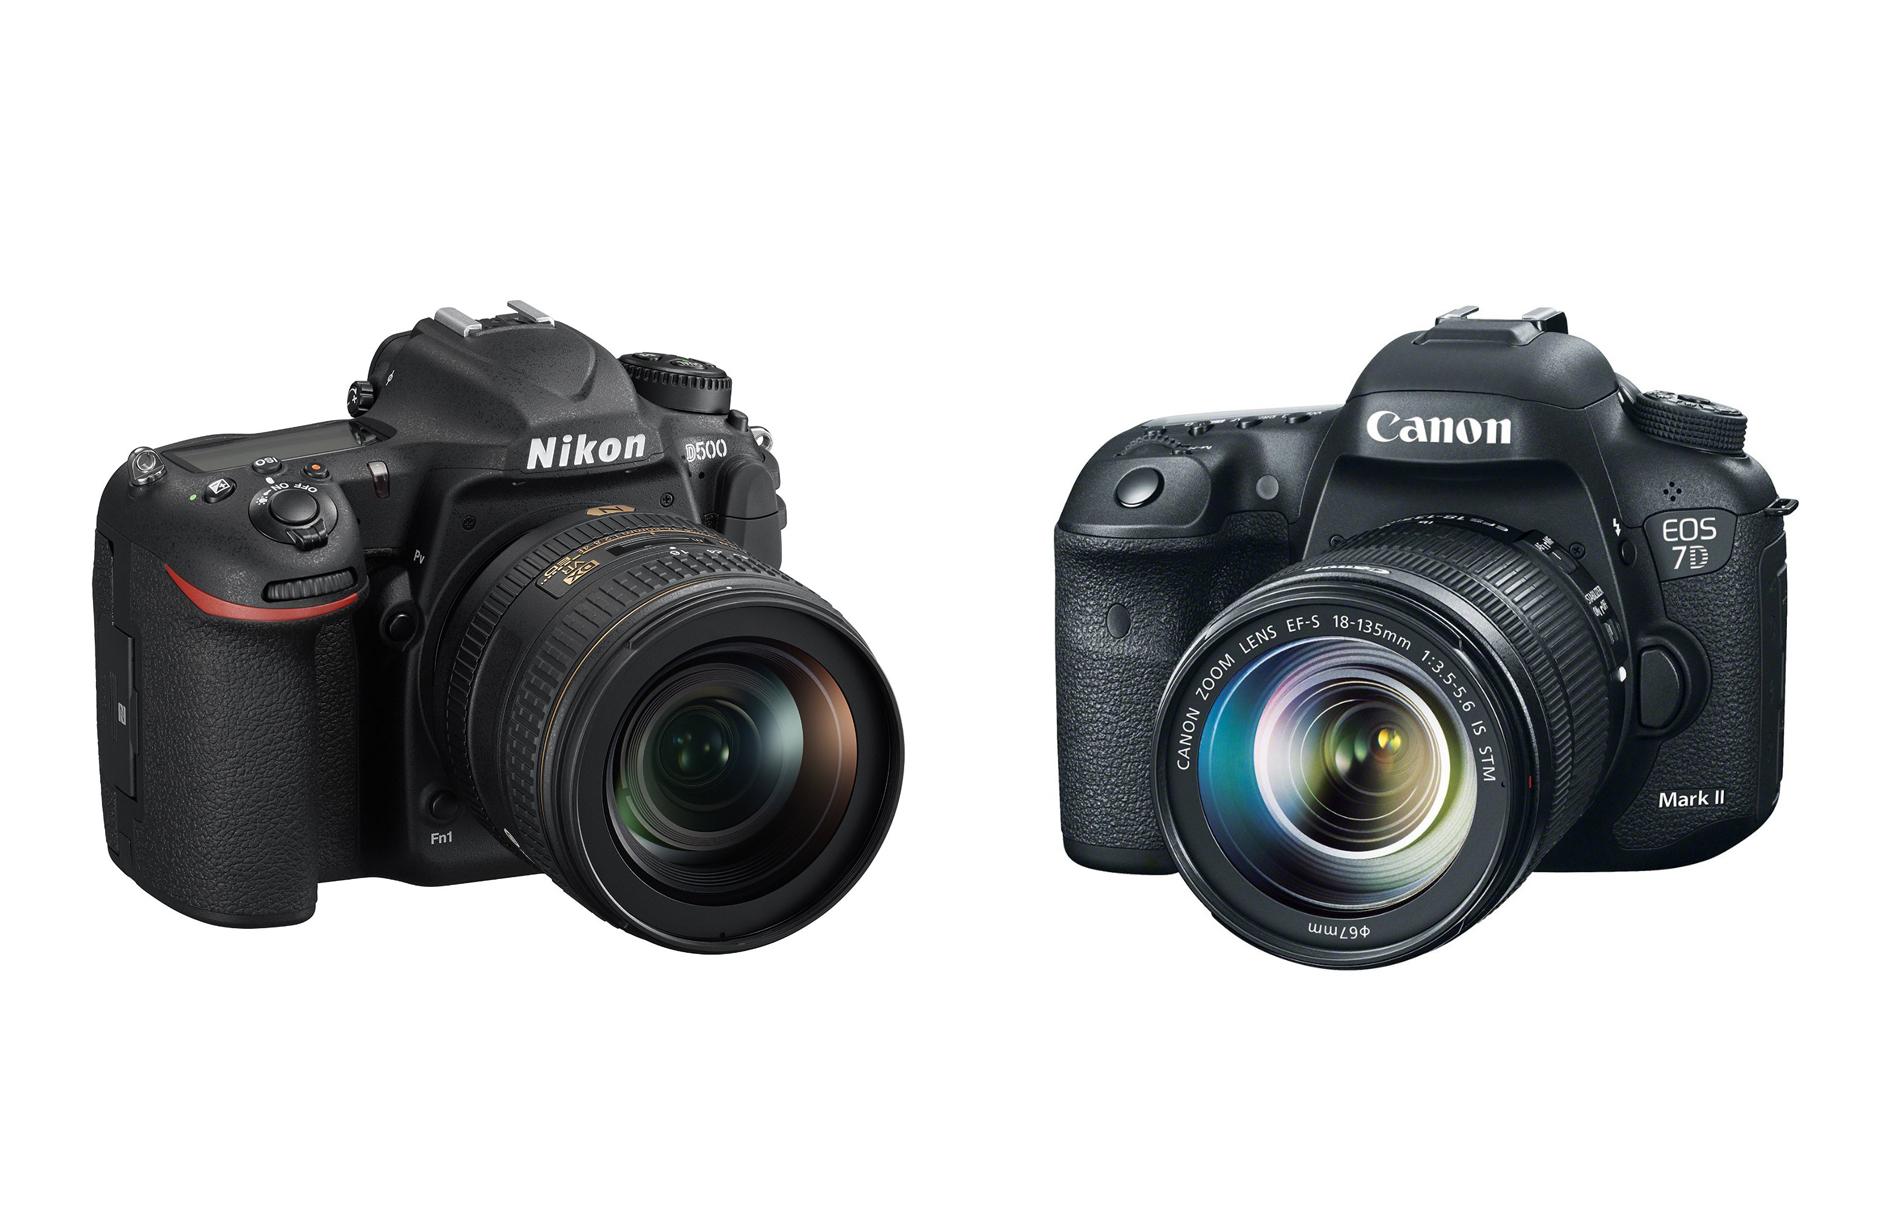 Canon vs. Nikon: Choosing the Right Camera System